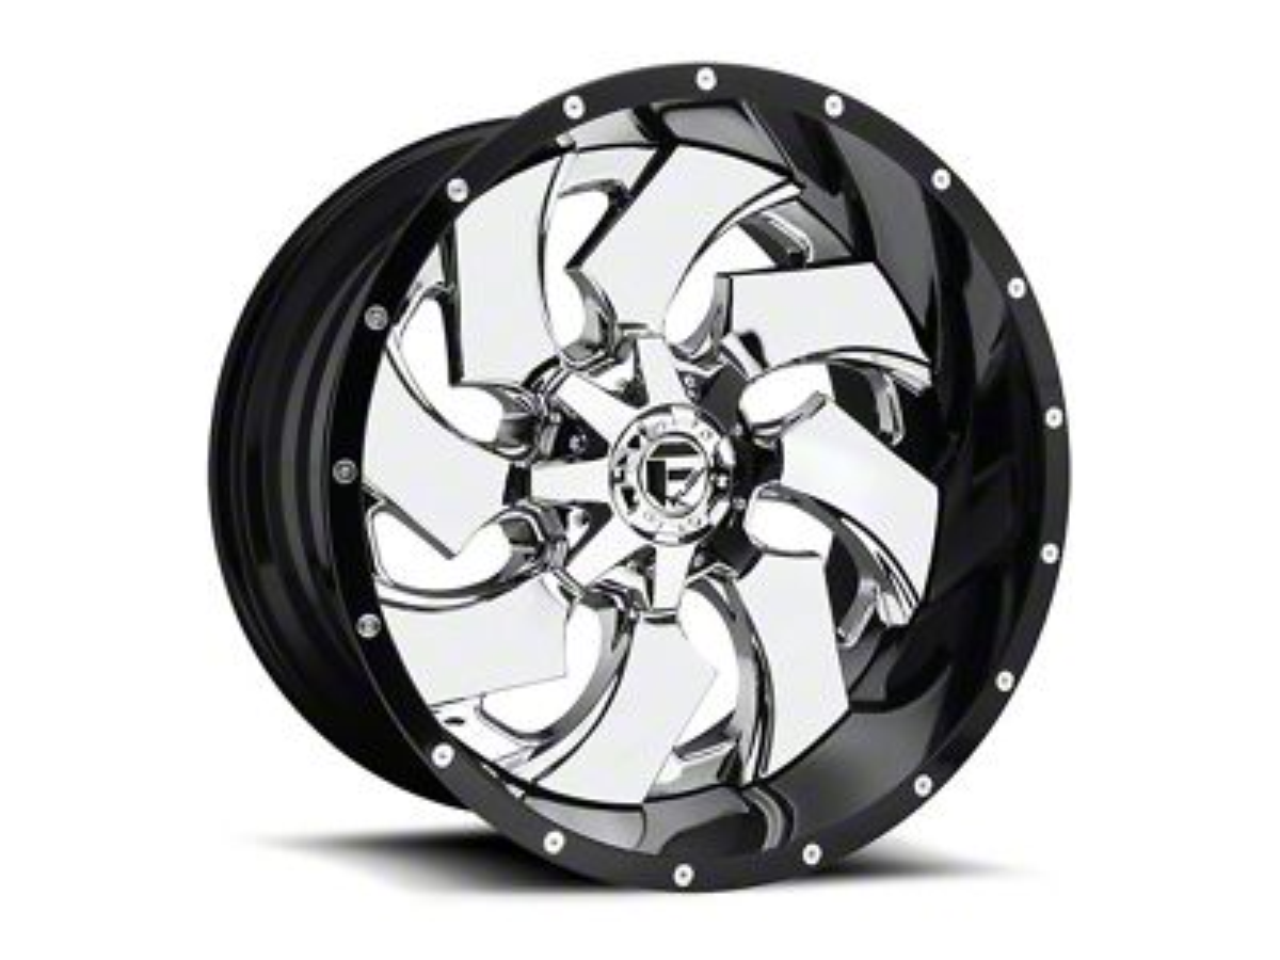 Fuel Wheels Cleaver Chrome 6-Lug Wheel - 24x12 (07-18 Sierra 1500)